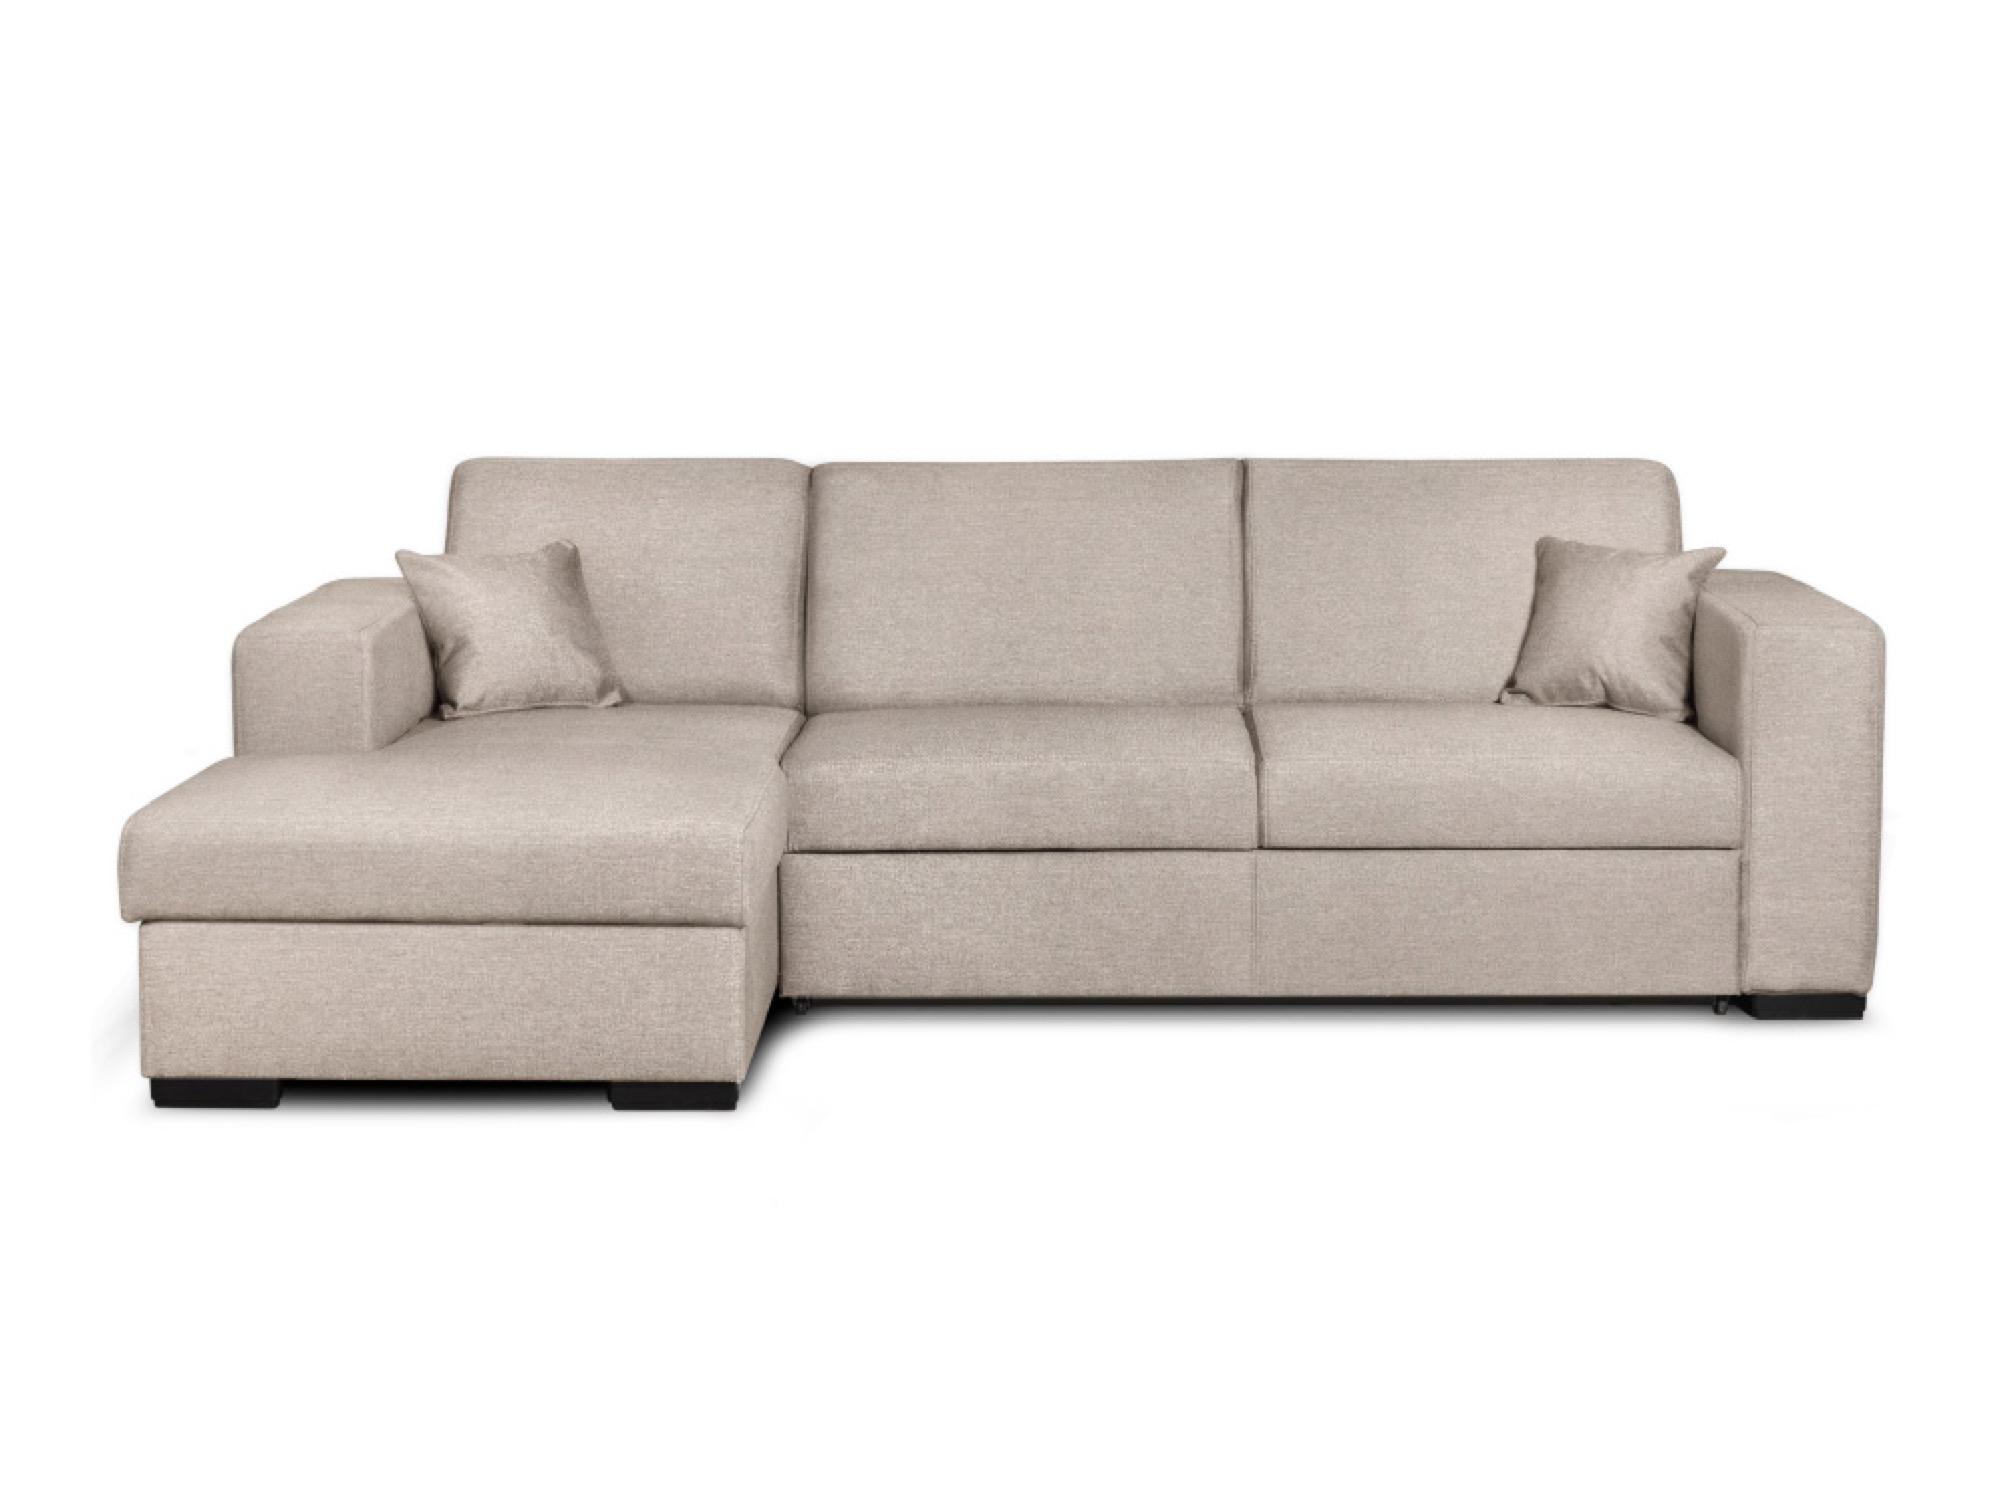 Canapé d'angle gauche convertible en tissu beige